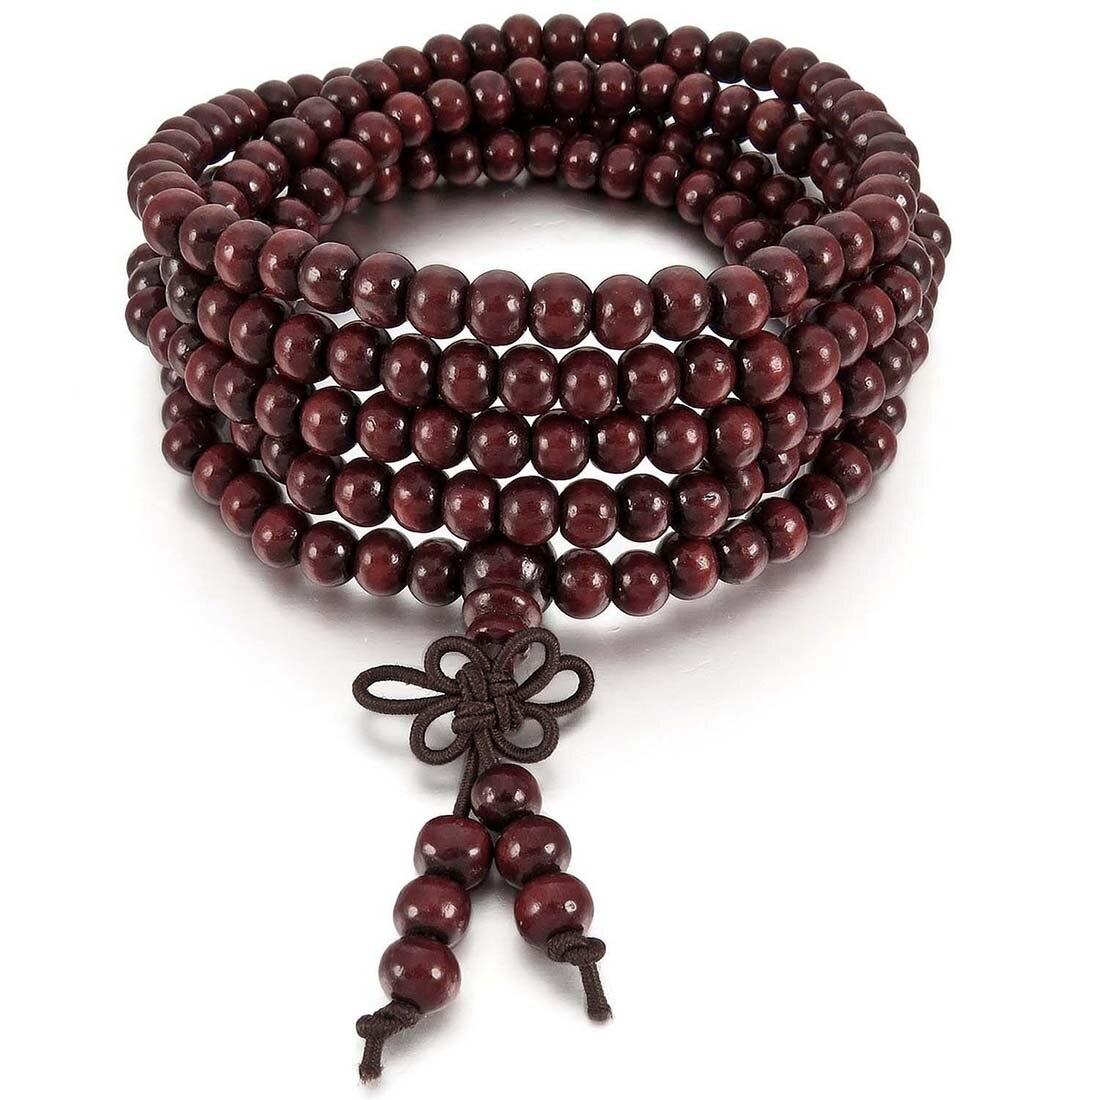 Homme Bracelet 108 Perles Bouddhistes Collier Mala Tibétain Bouddha Chinois 6mm